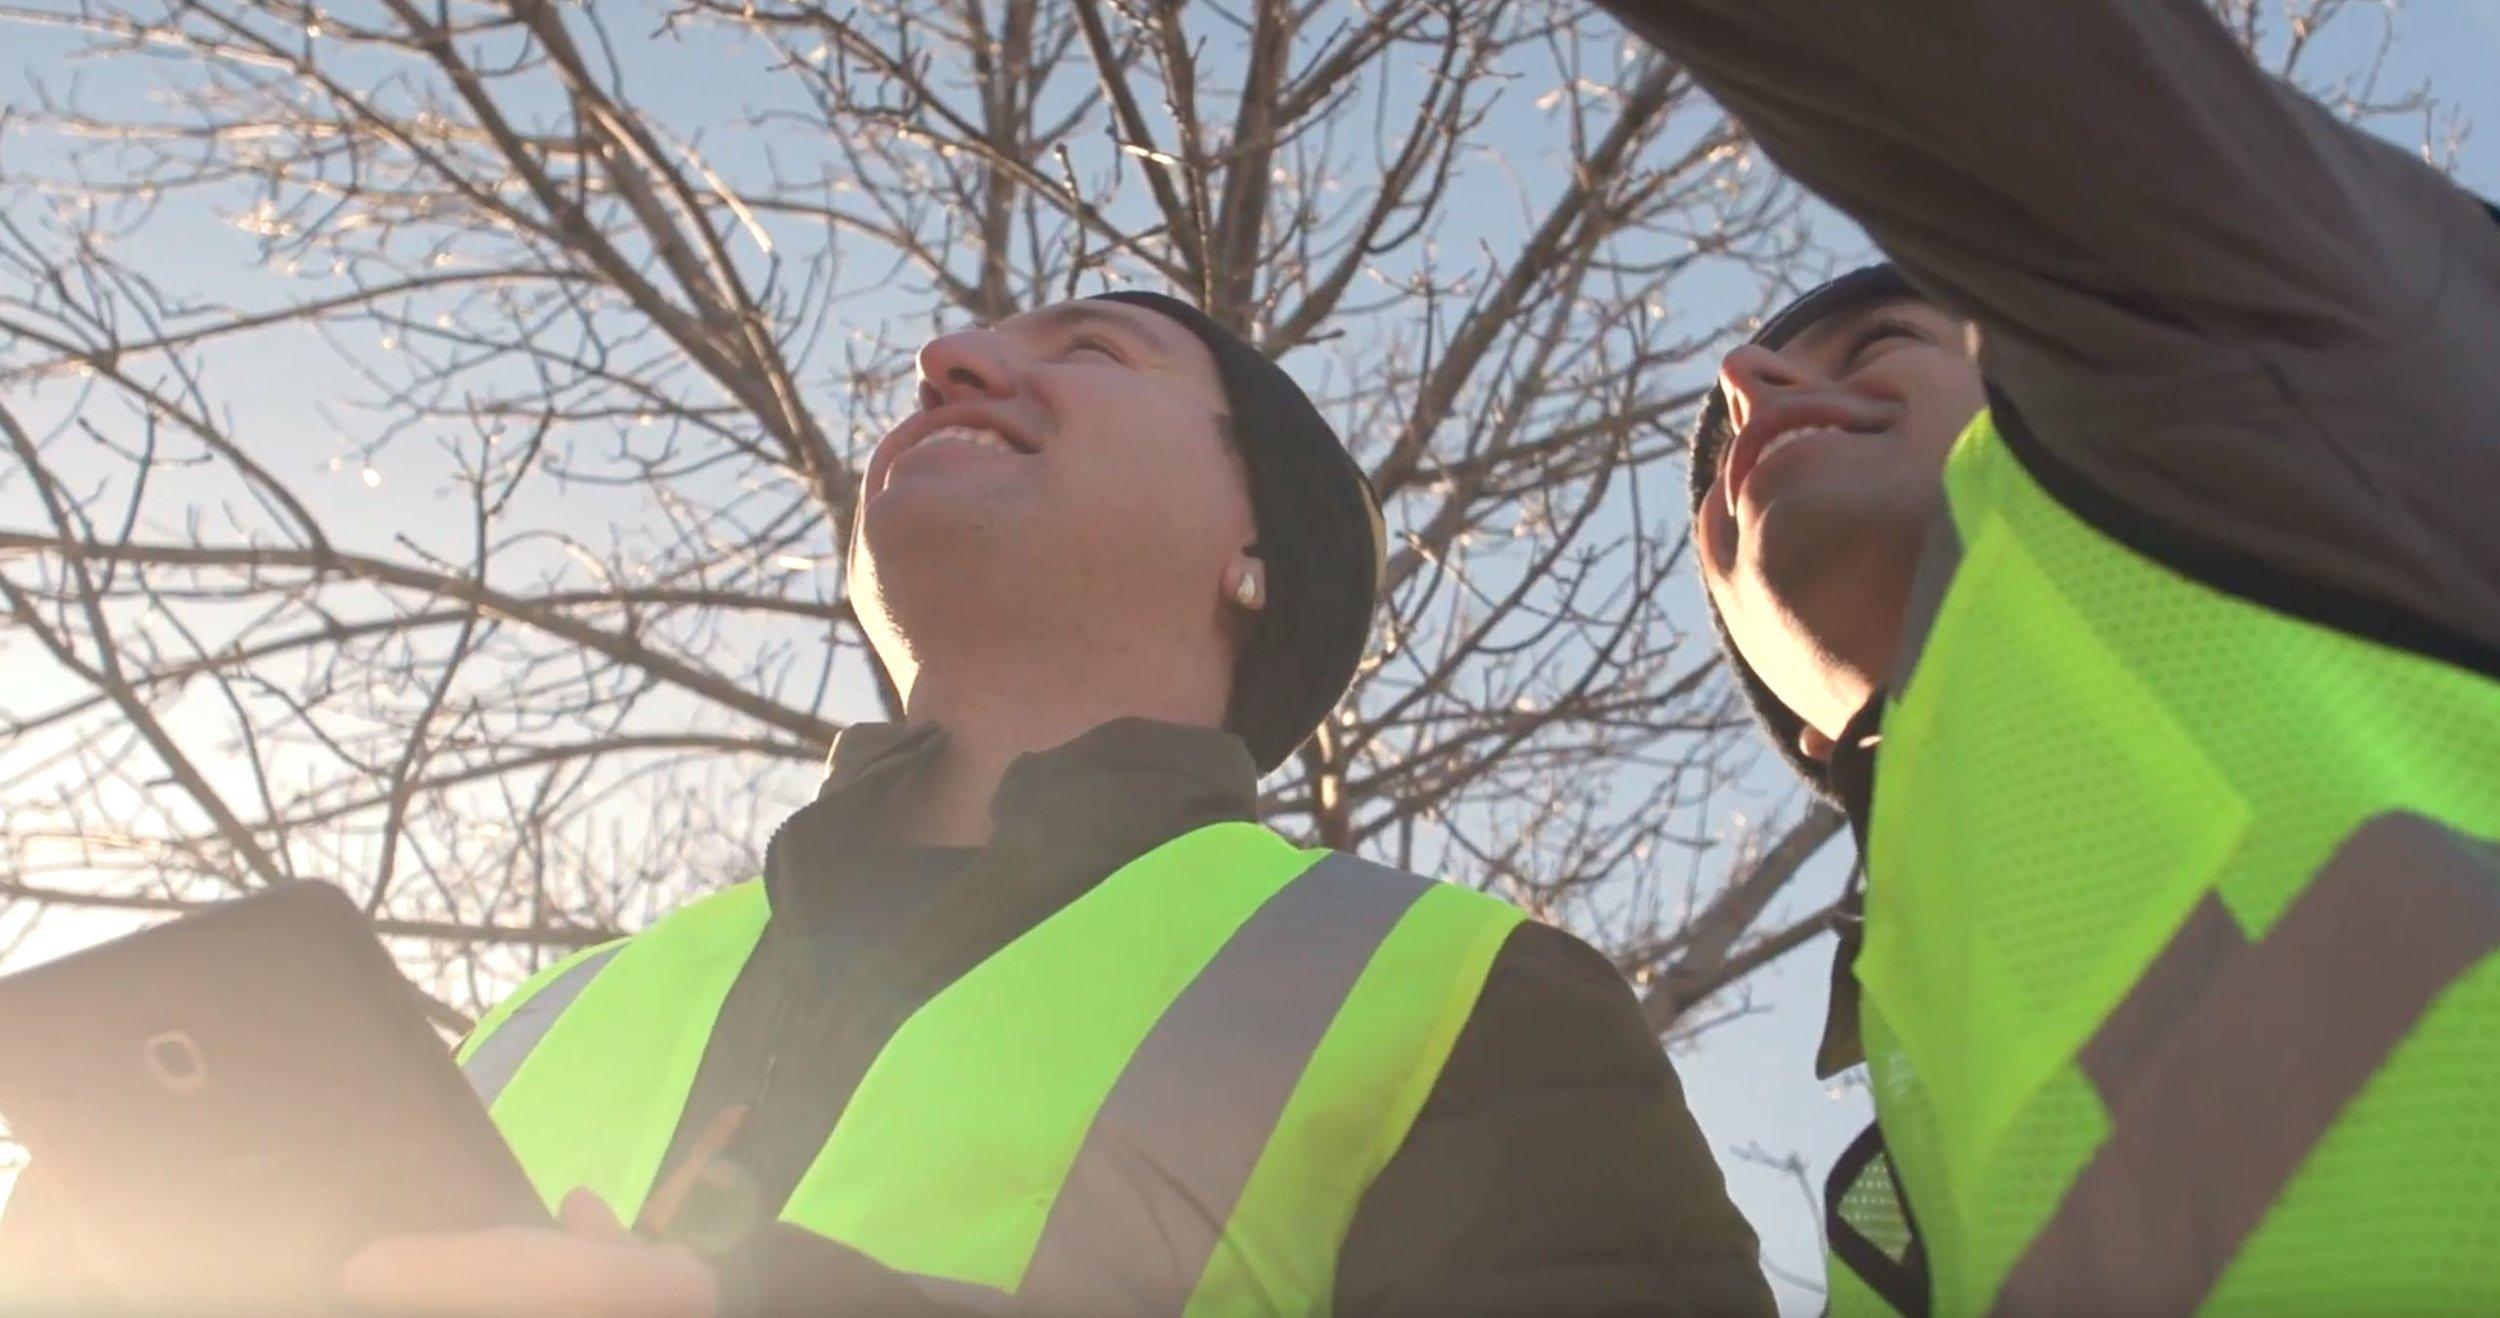 GIS Field Technicians - Street and Roadway Lighting Audit